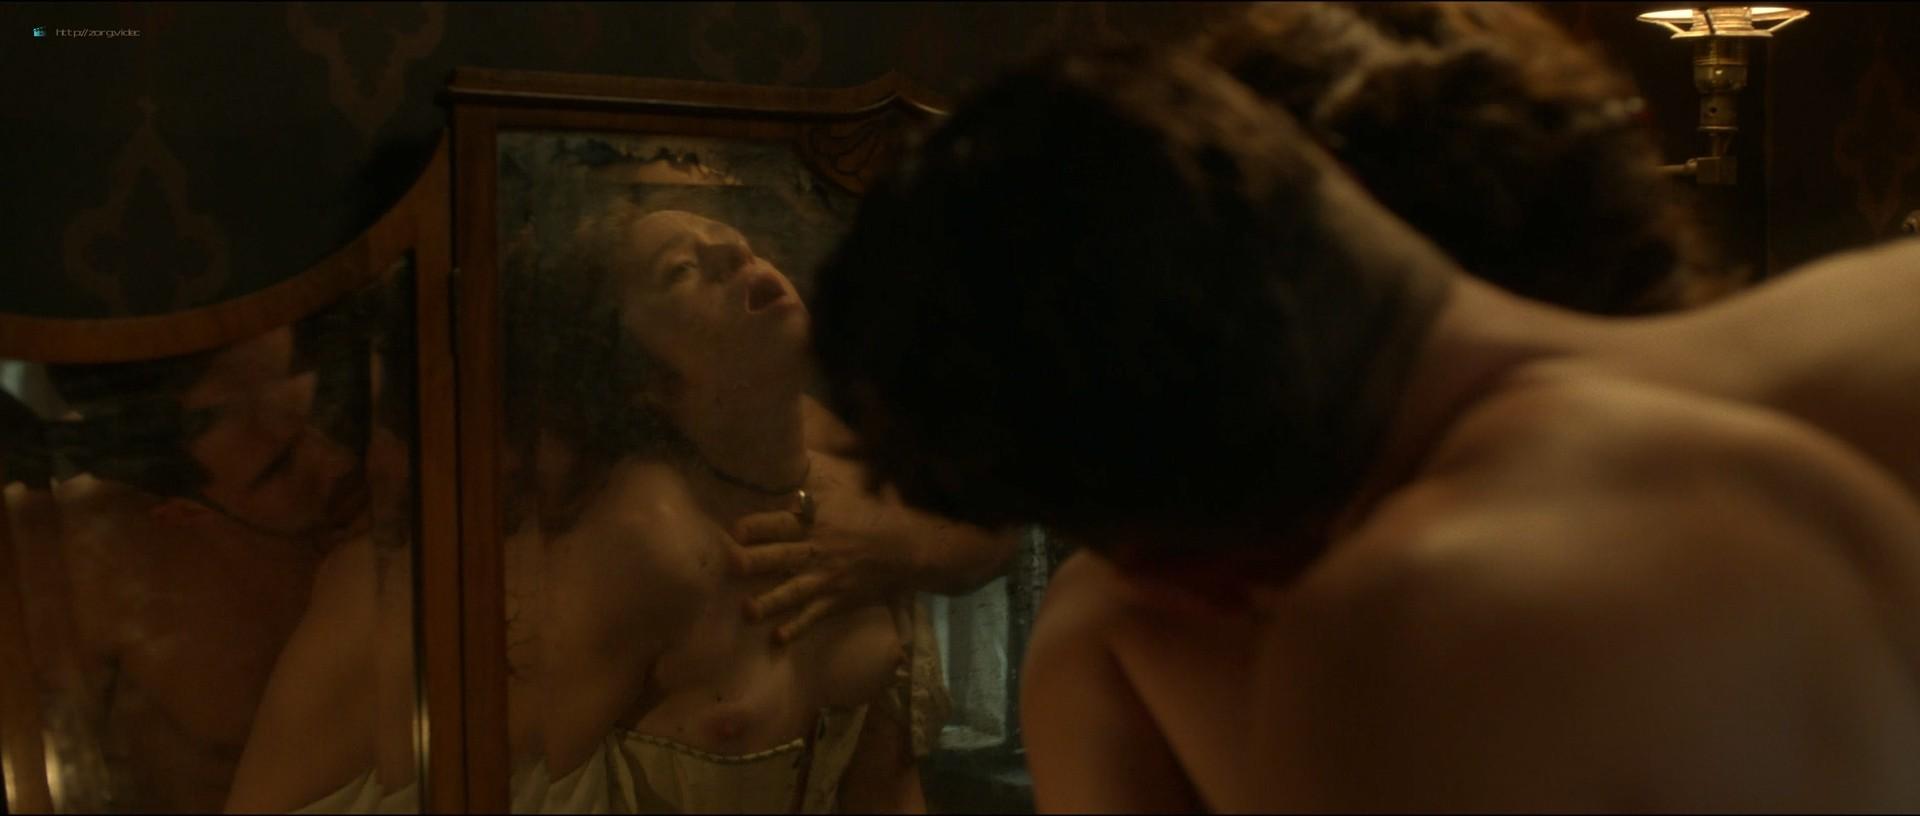 Maeve Dermody nude sex Karla Crome nude too - Carnival Row (2019) s1e1 HD 1080p (11)